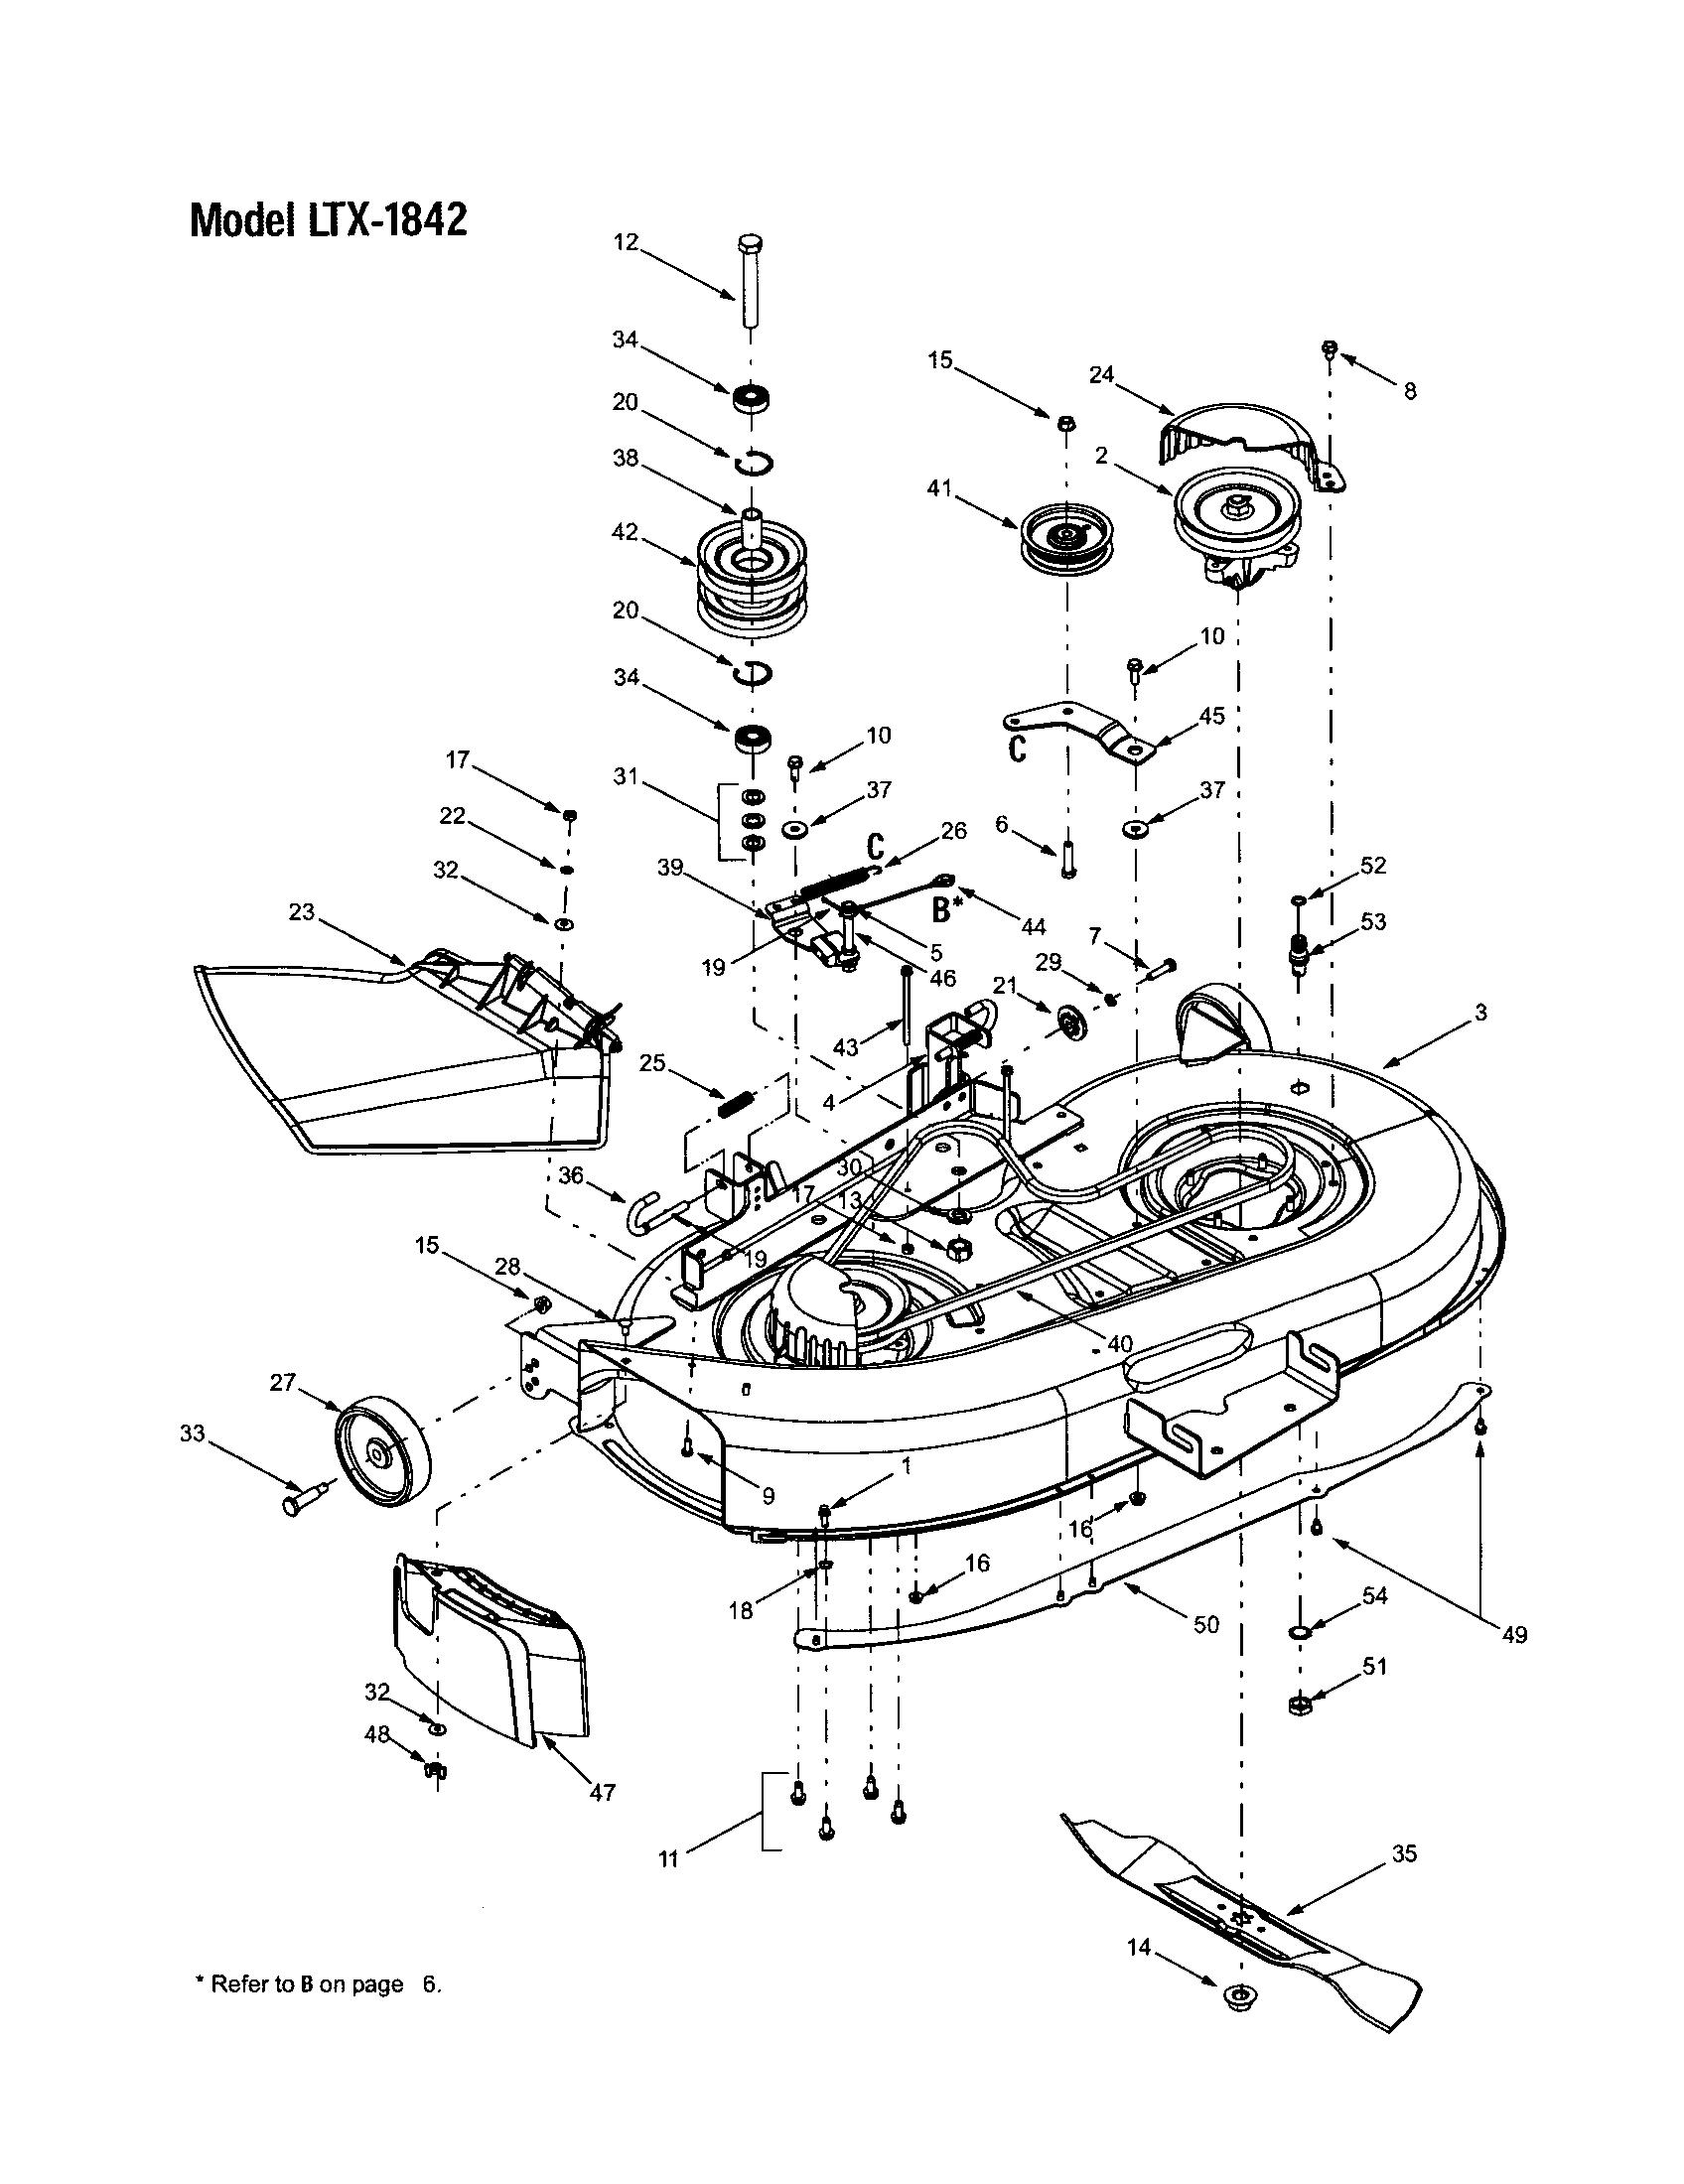 Troy bilt ztr wiring diagram wiring diagram for troy bilt zero turn images wiring diagram troy